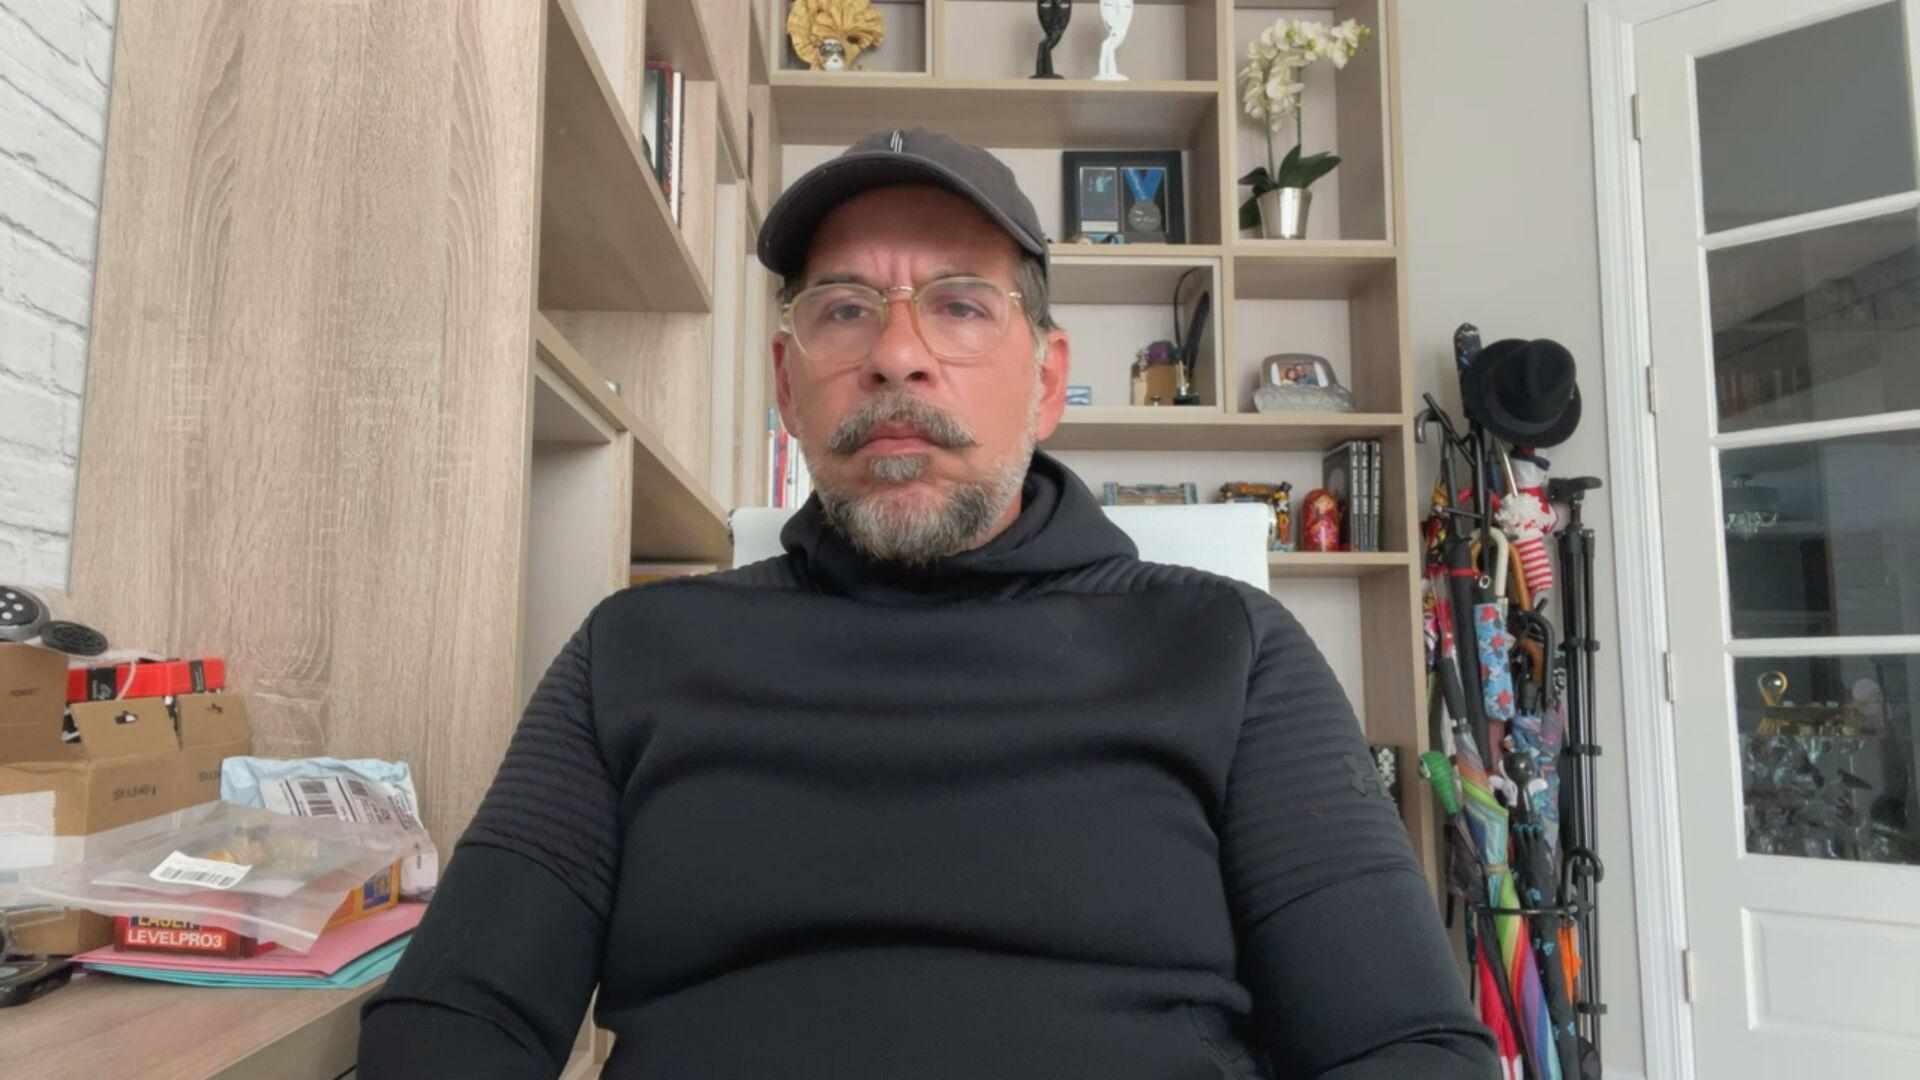 O ator e humorista Leandro Hassum durante entrevista à CNN